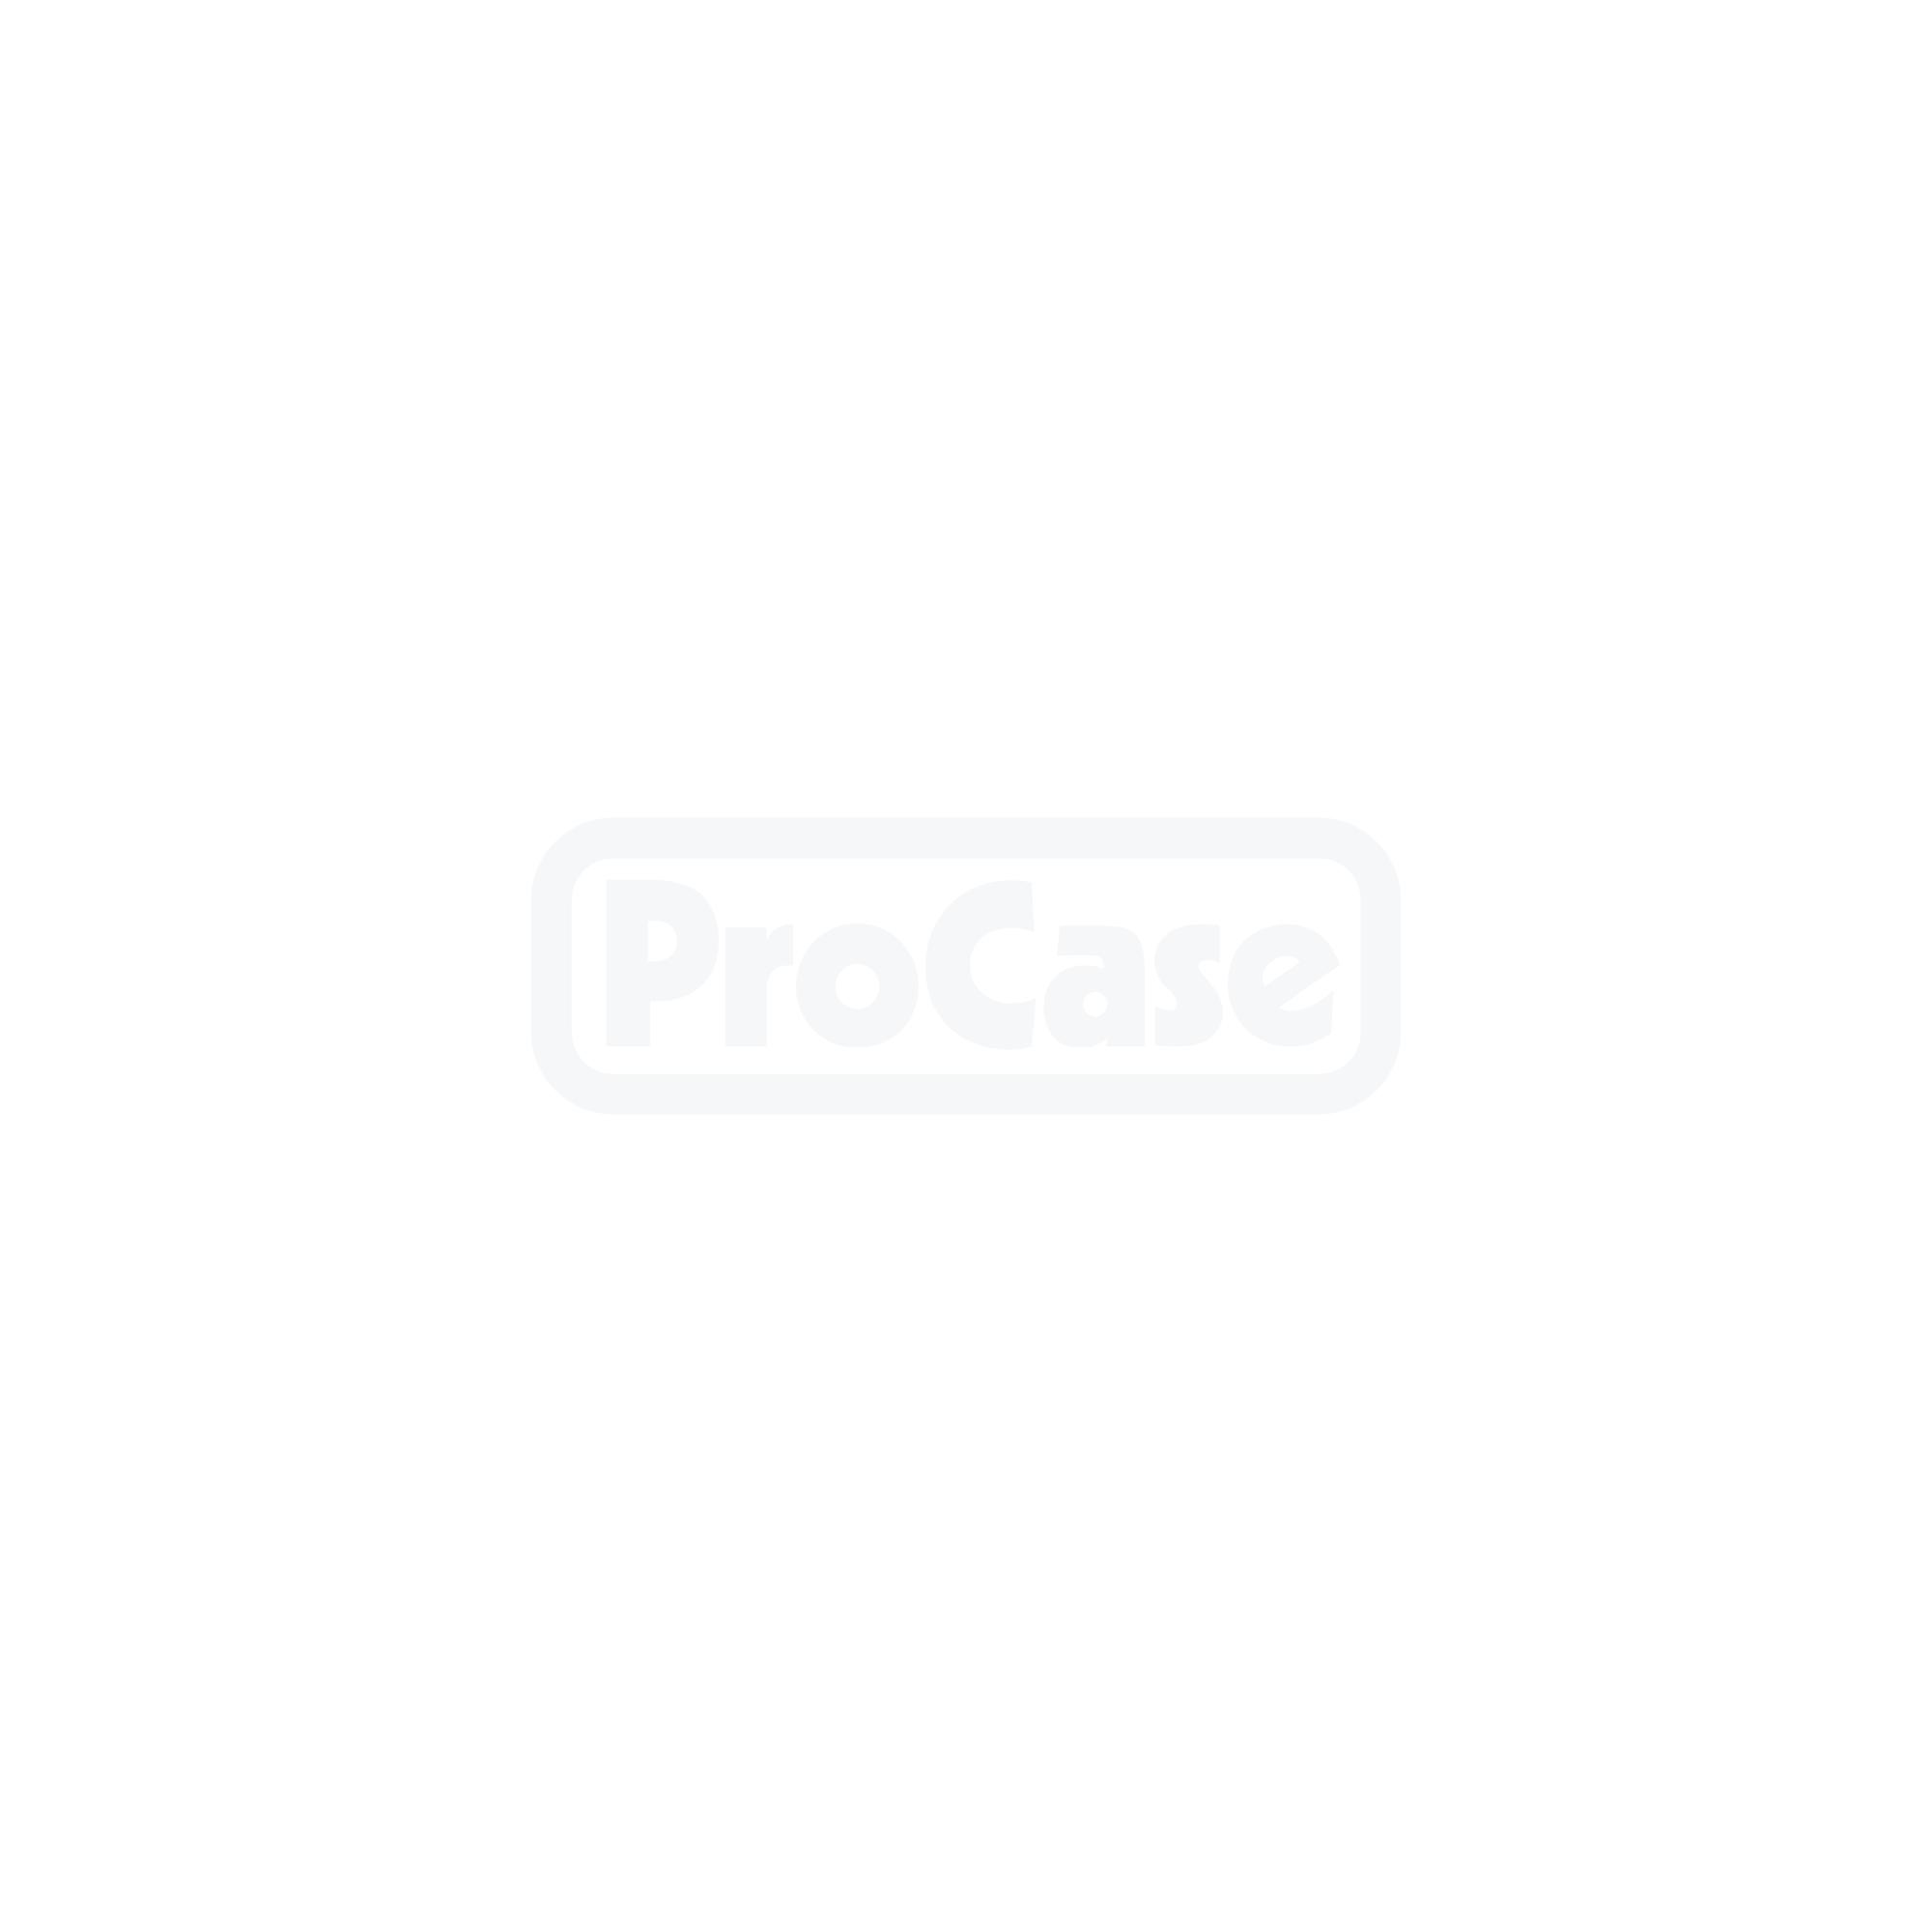 Mixercase für Blackmagic ATEM 1 M/E Advanced Panel / Camera Control Panel